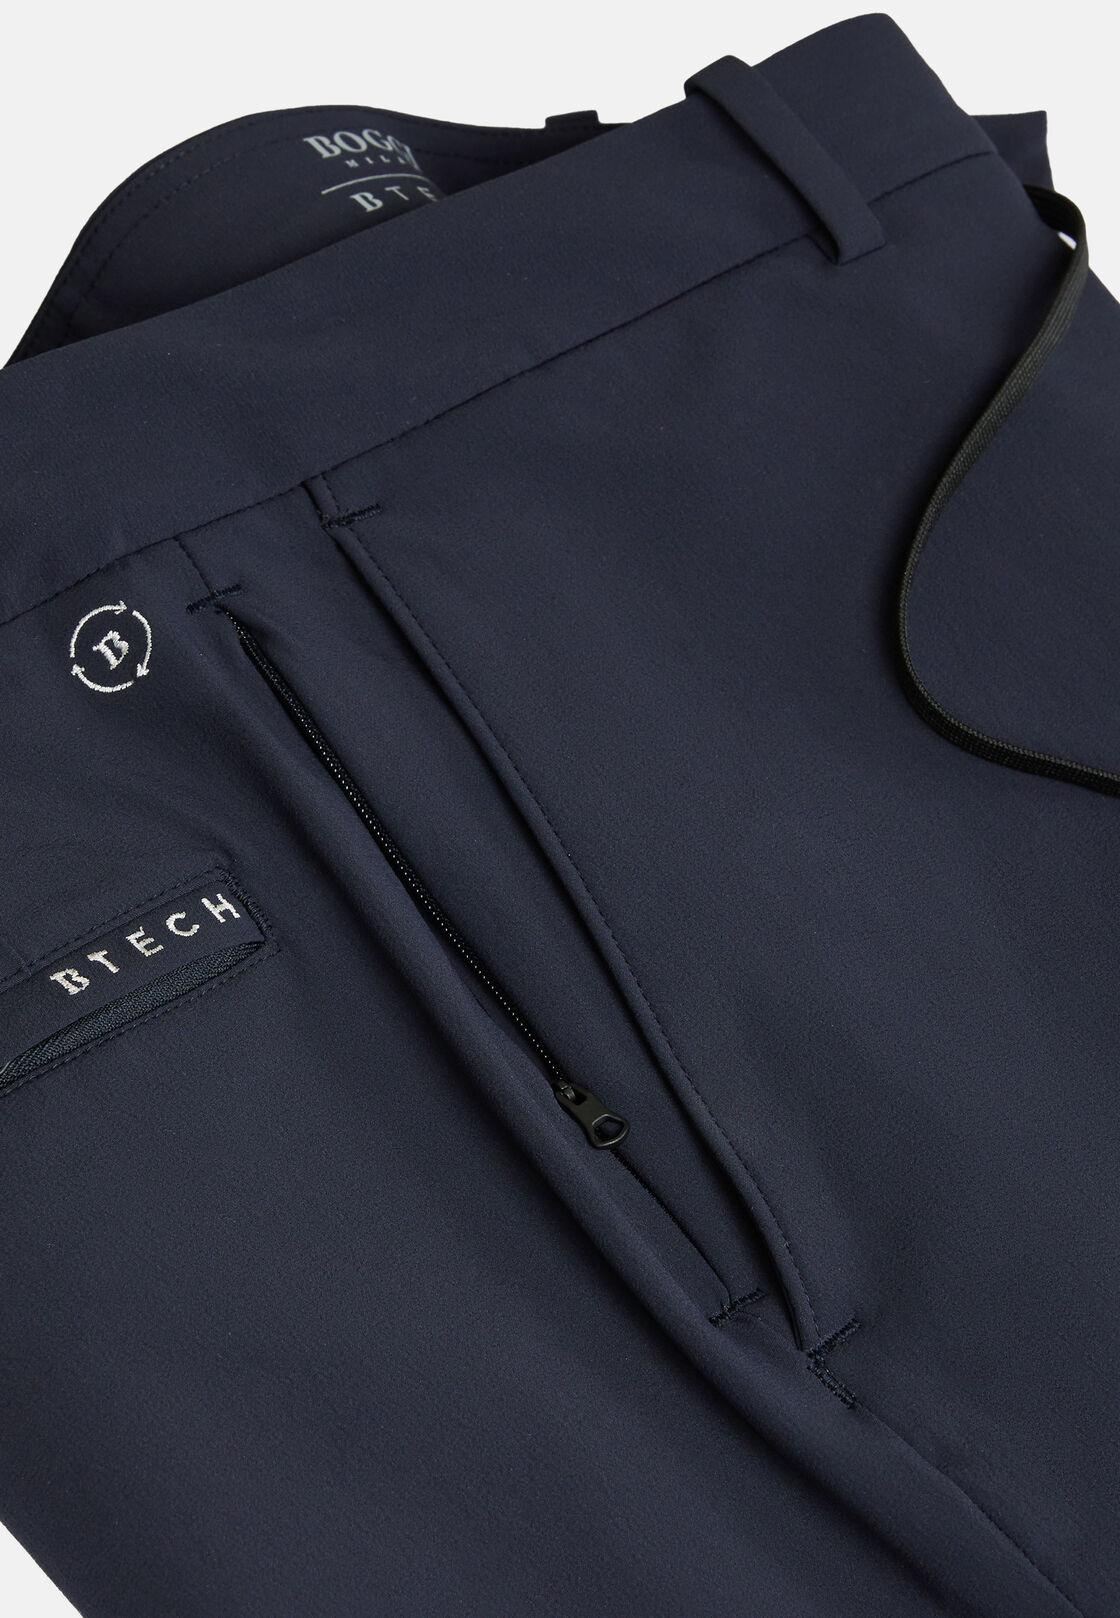 Hose aus elastischem recyceltem nylon b tech, Navy blau, hi-res